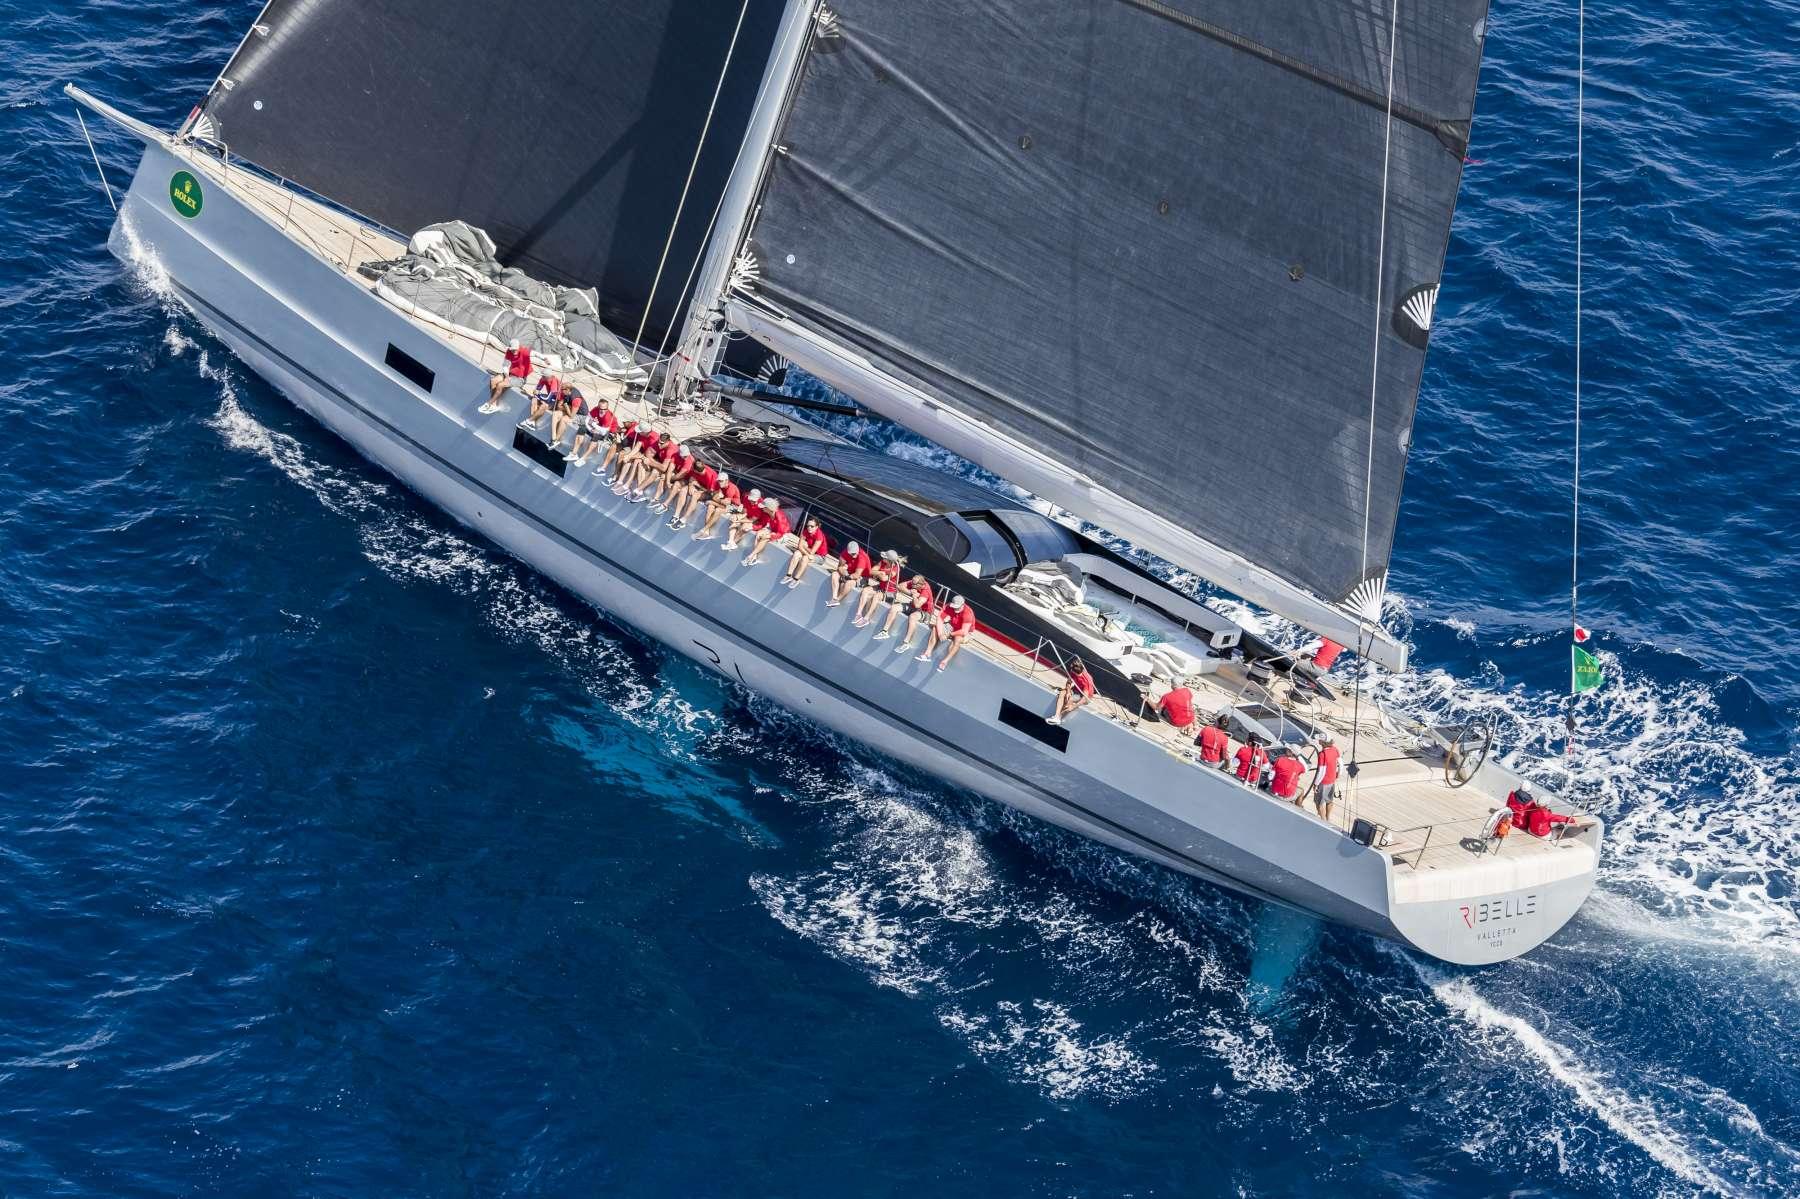 Maxi Yacht Rolex Cup 05 09 2017 Borlenghi 02